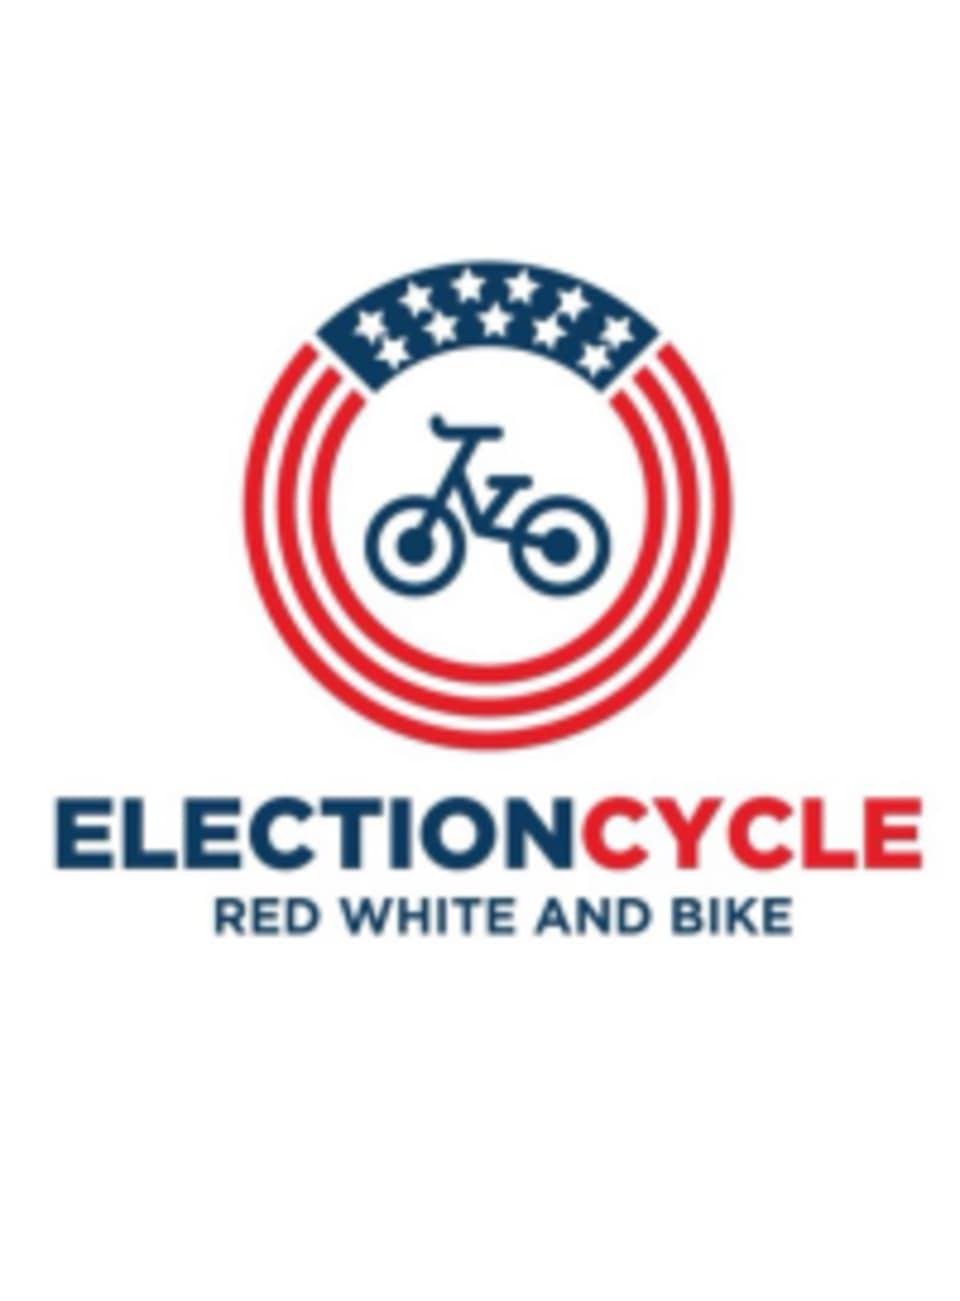 ElectionCycle logo